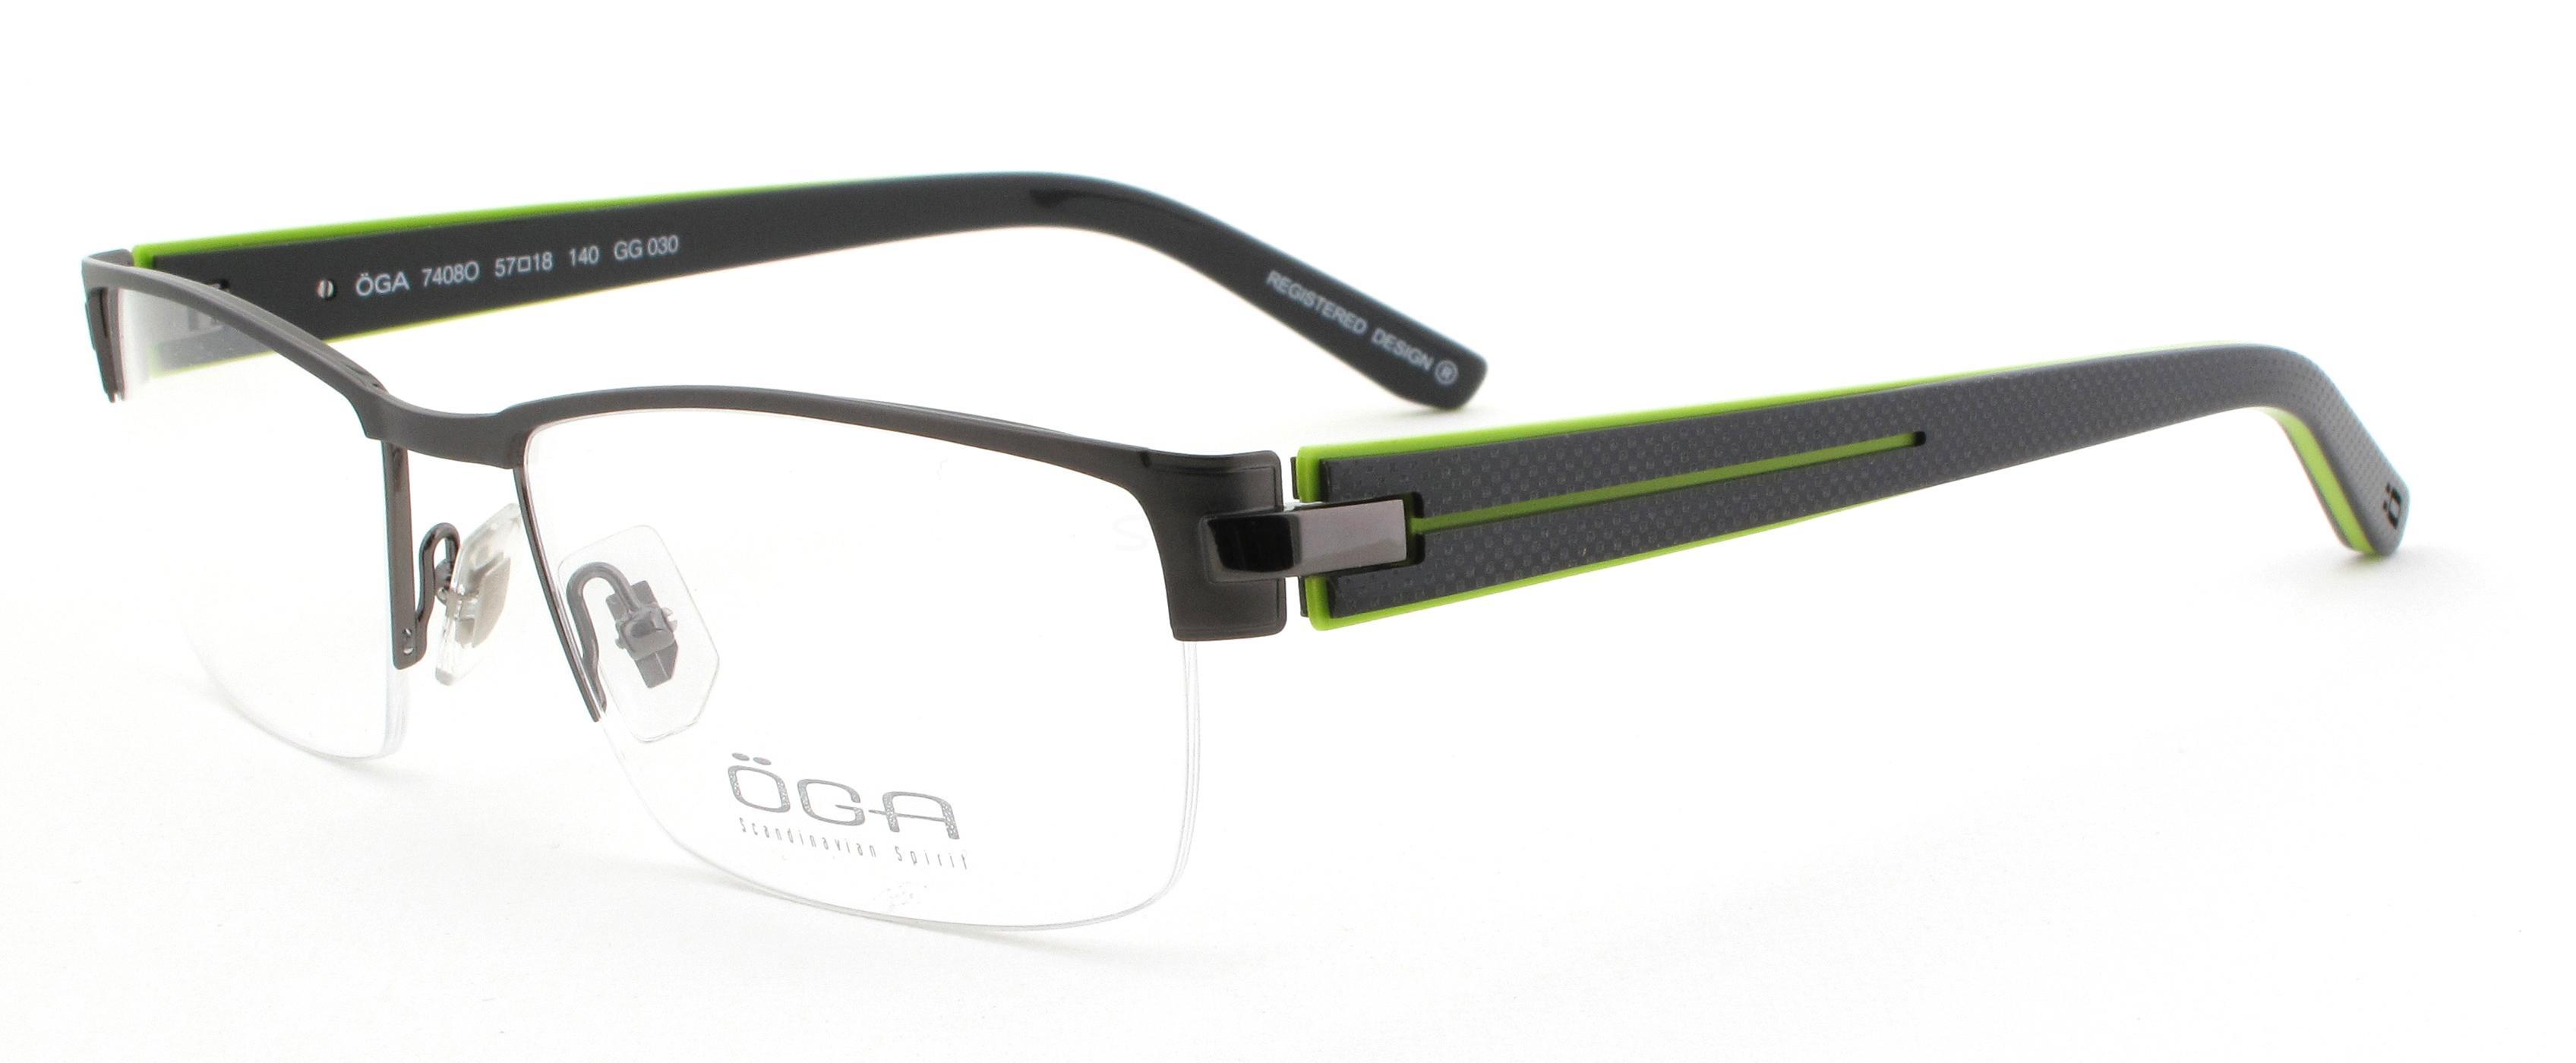 GG030 7408O TALVAC 1 Glasses, ÖGA Scandinavian Spirit